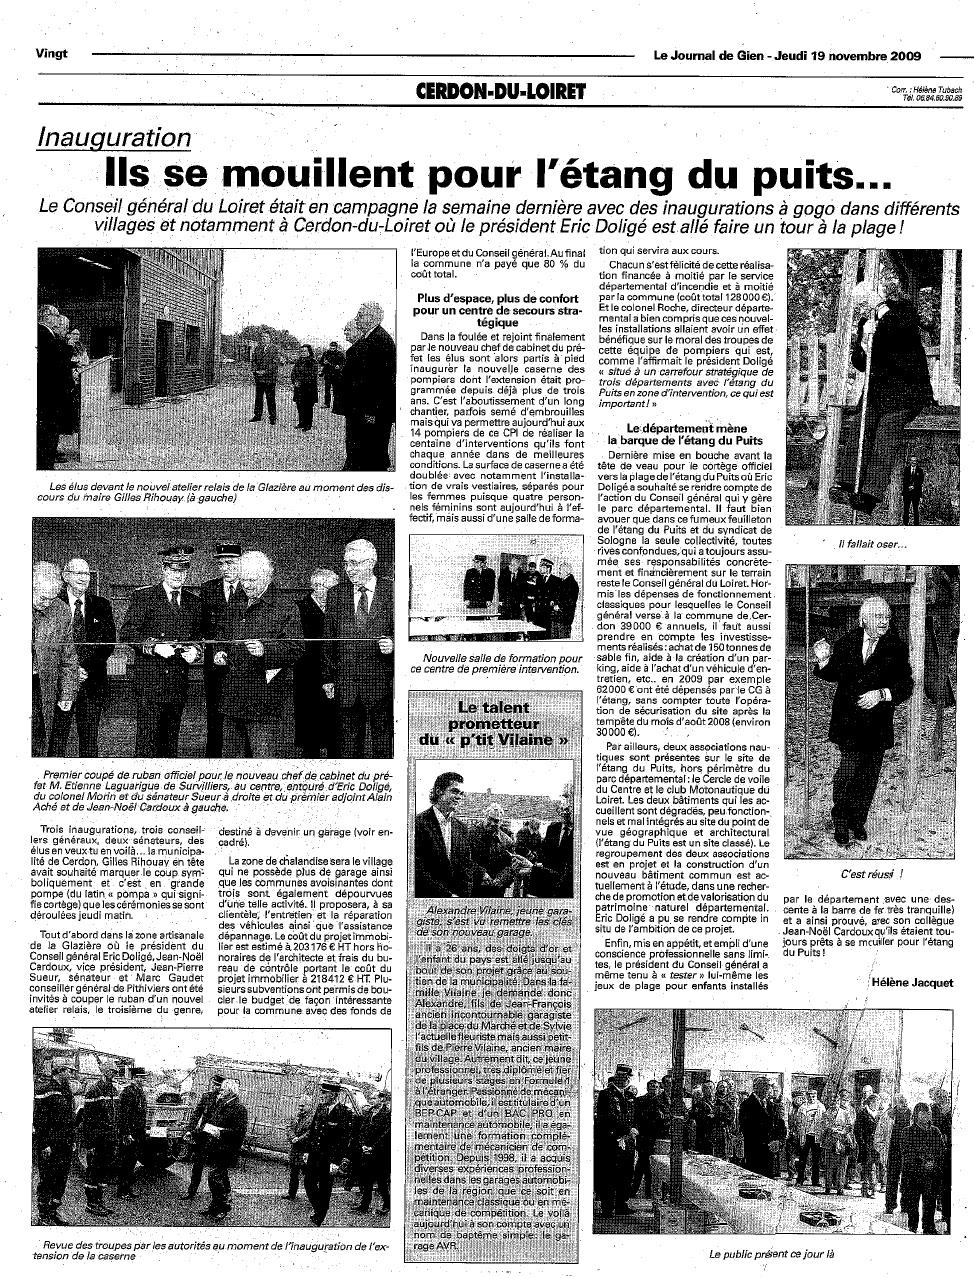 091119_journalgien_cerdon